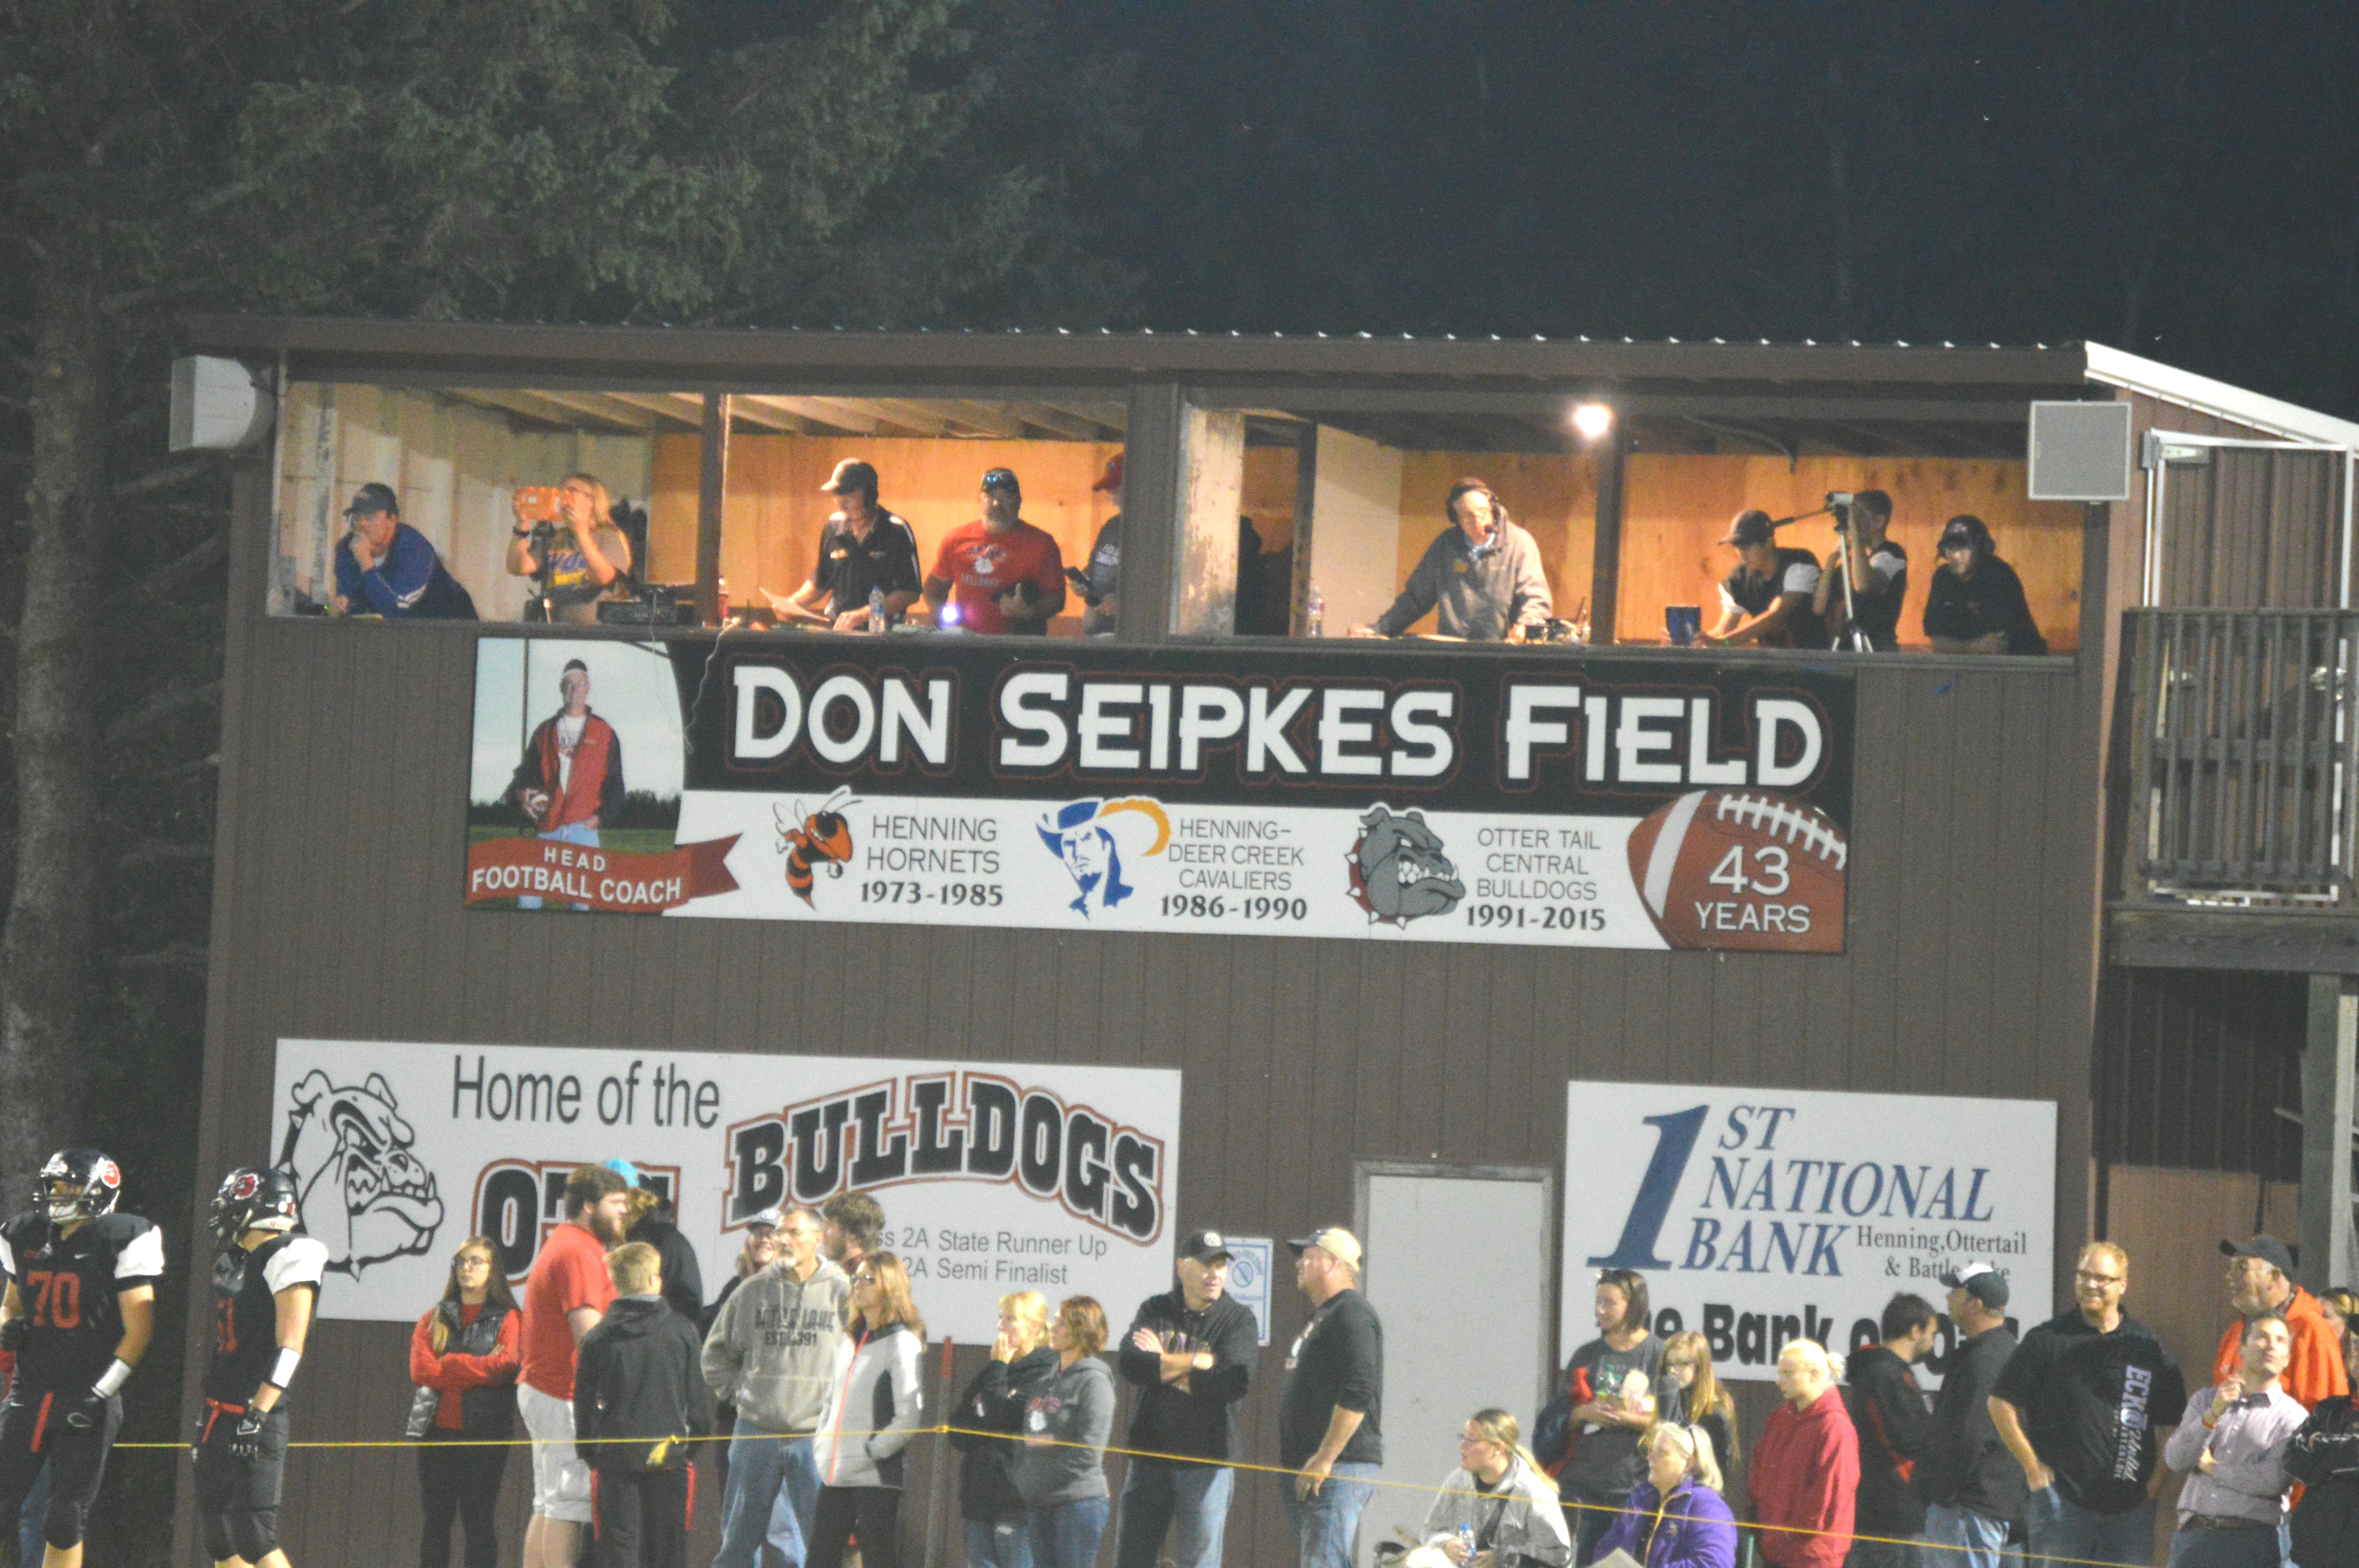 Henning Field Dedicated To Coach Don Seipkes/Bulldogs Win